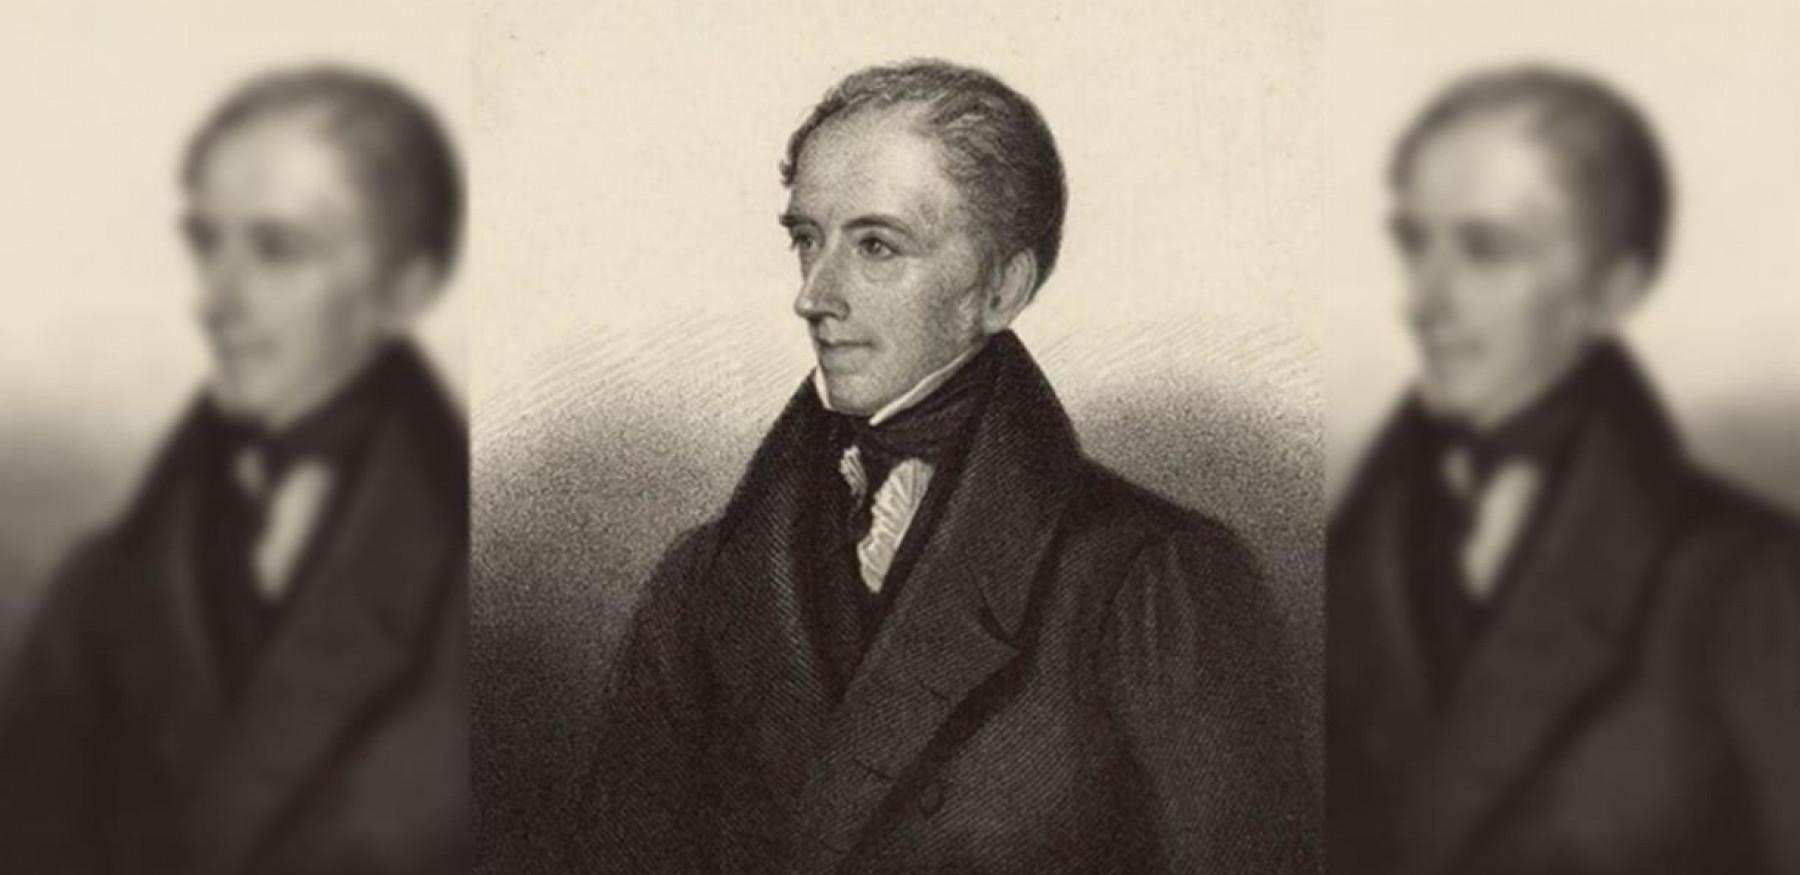 James Monthomery